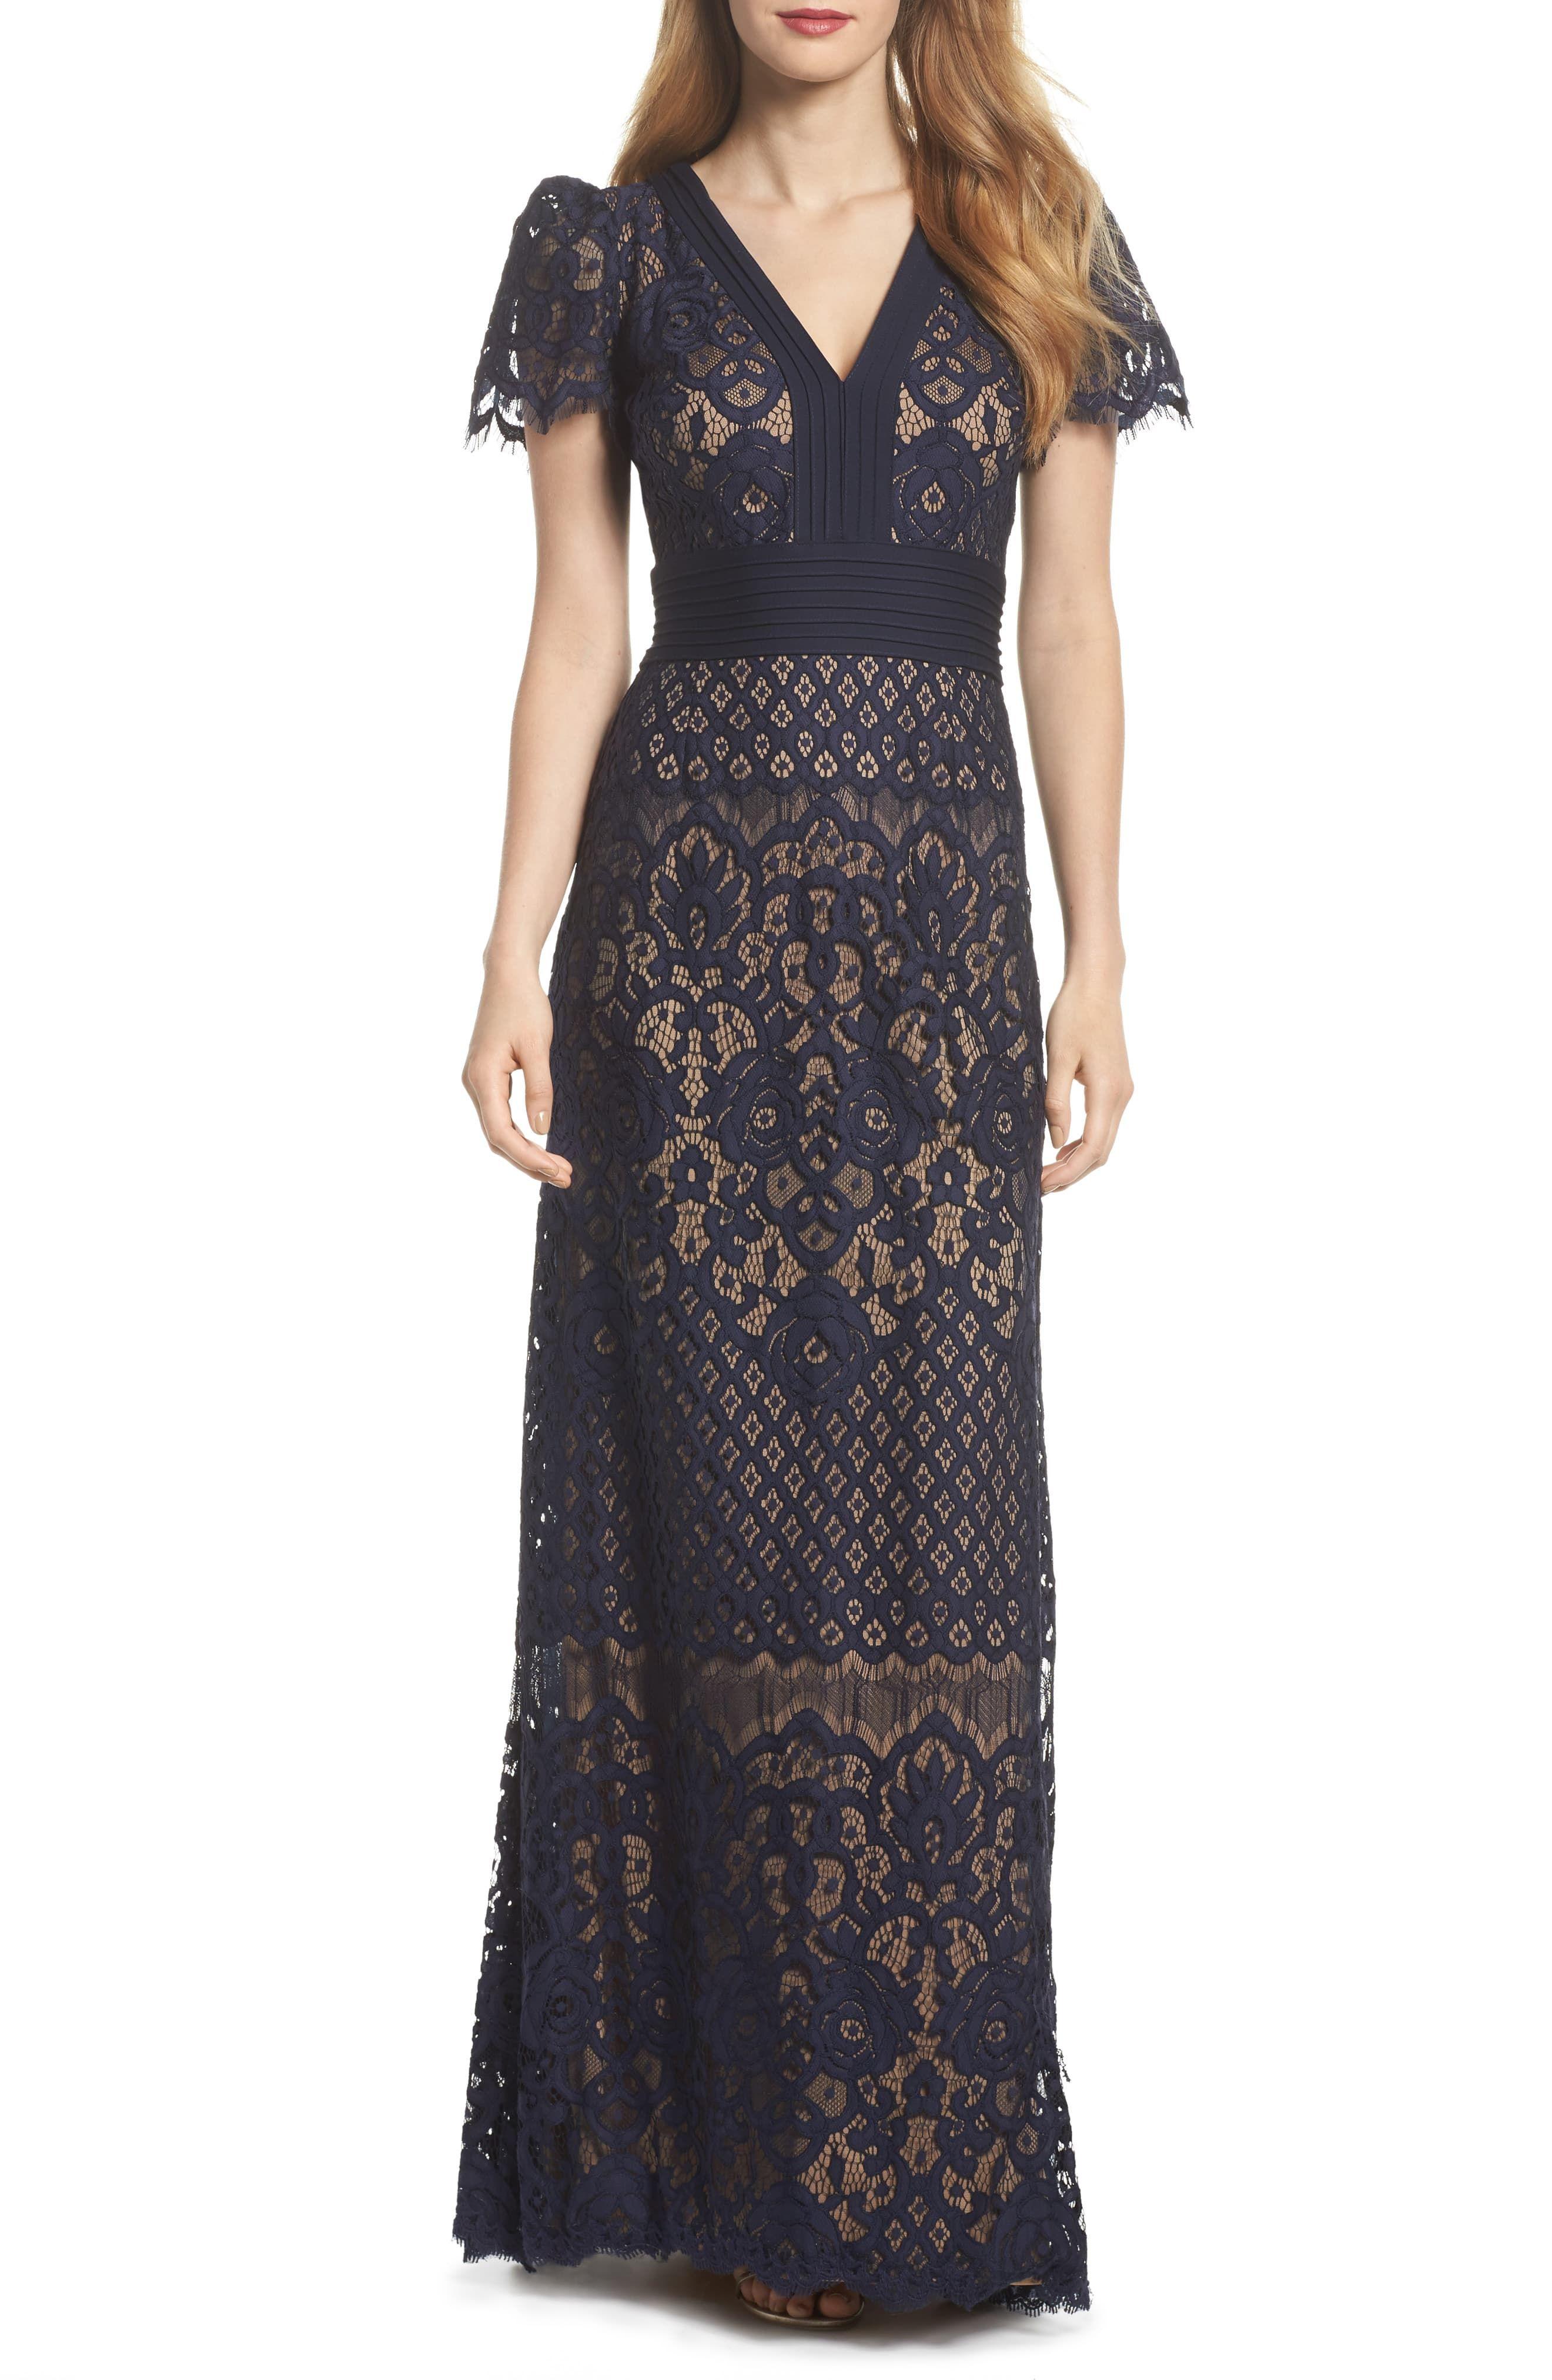 Tadashi Shoji Pintuck Detail Lace Gown Nordstrom Lace Gown Fashion Clothes Women Womens Dresses [ 4048 x 2640 Pixel ]